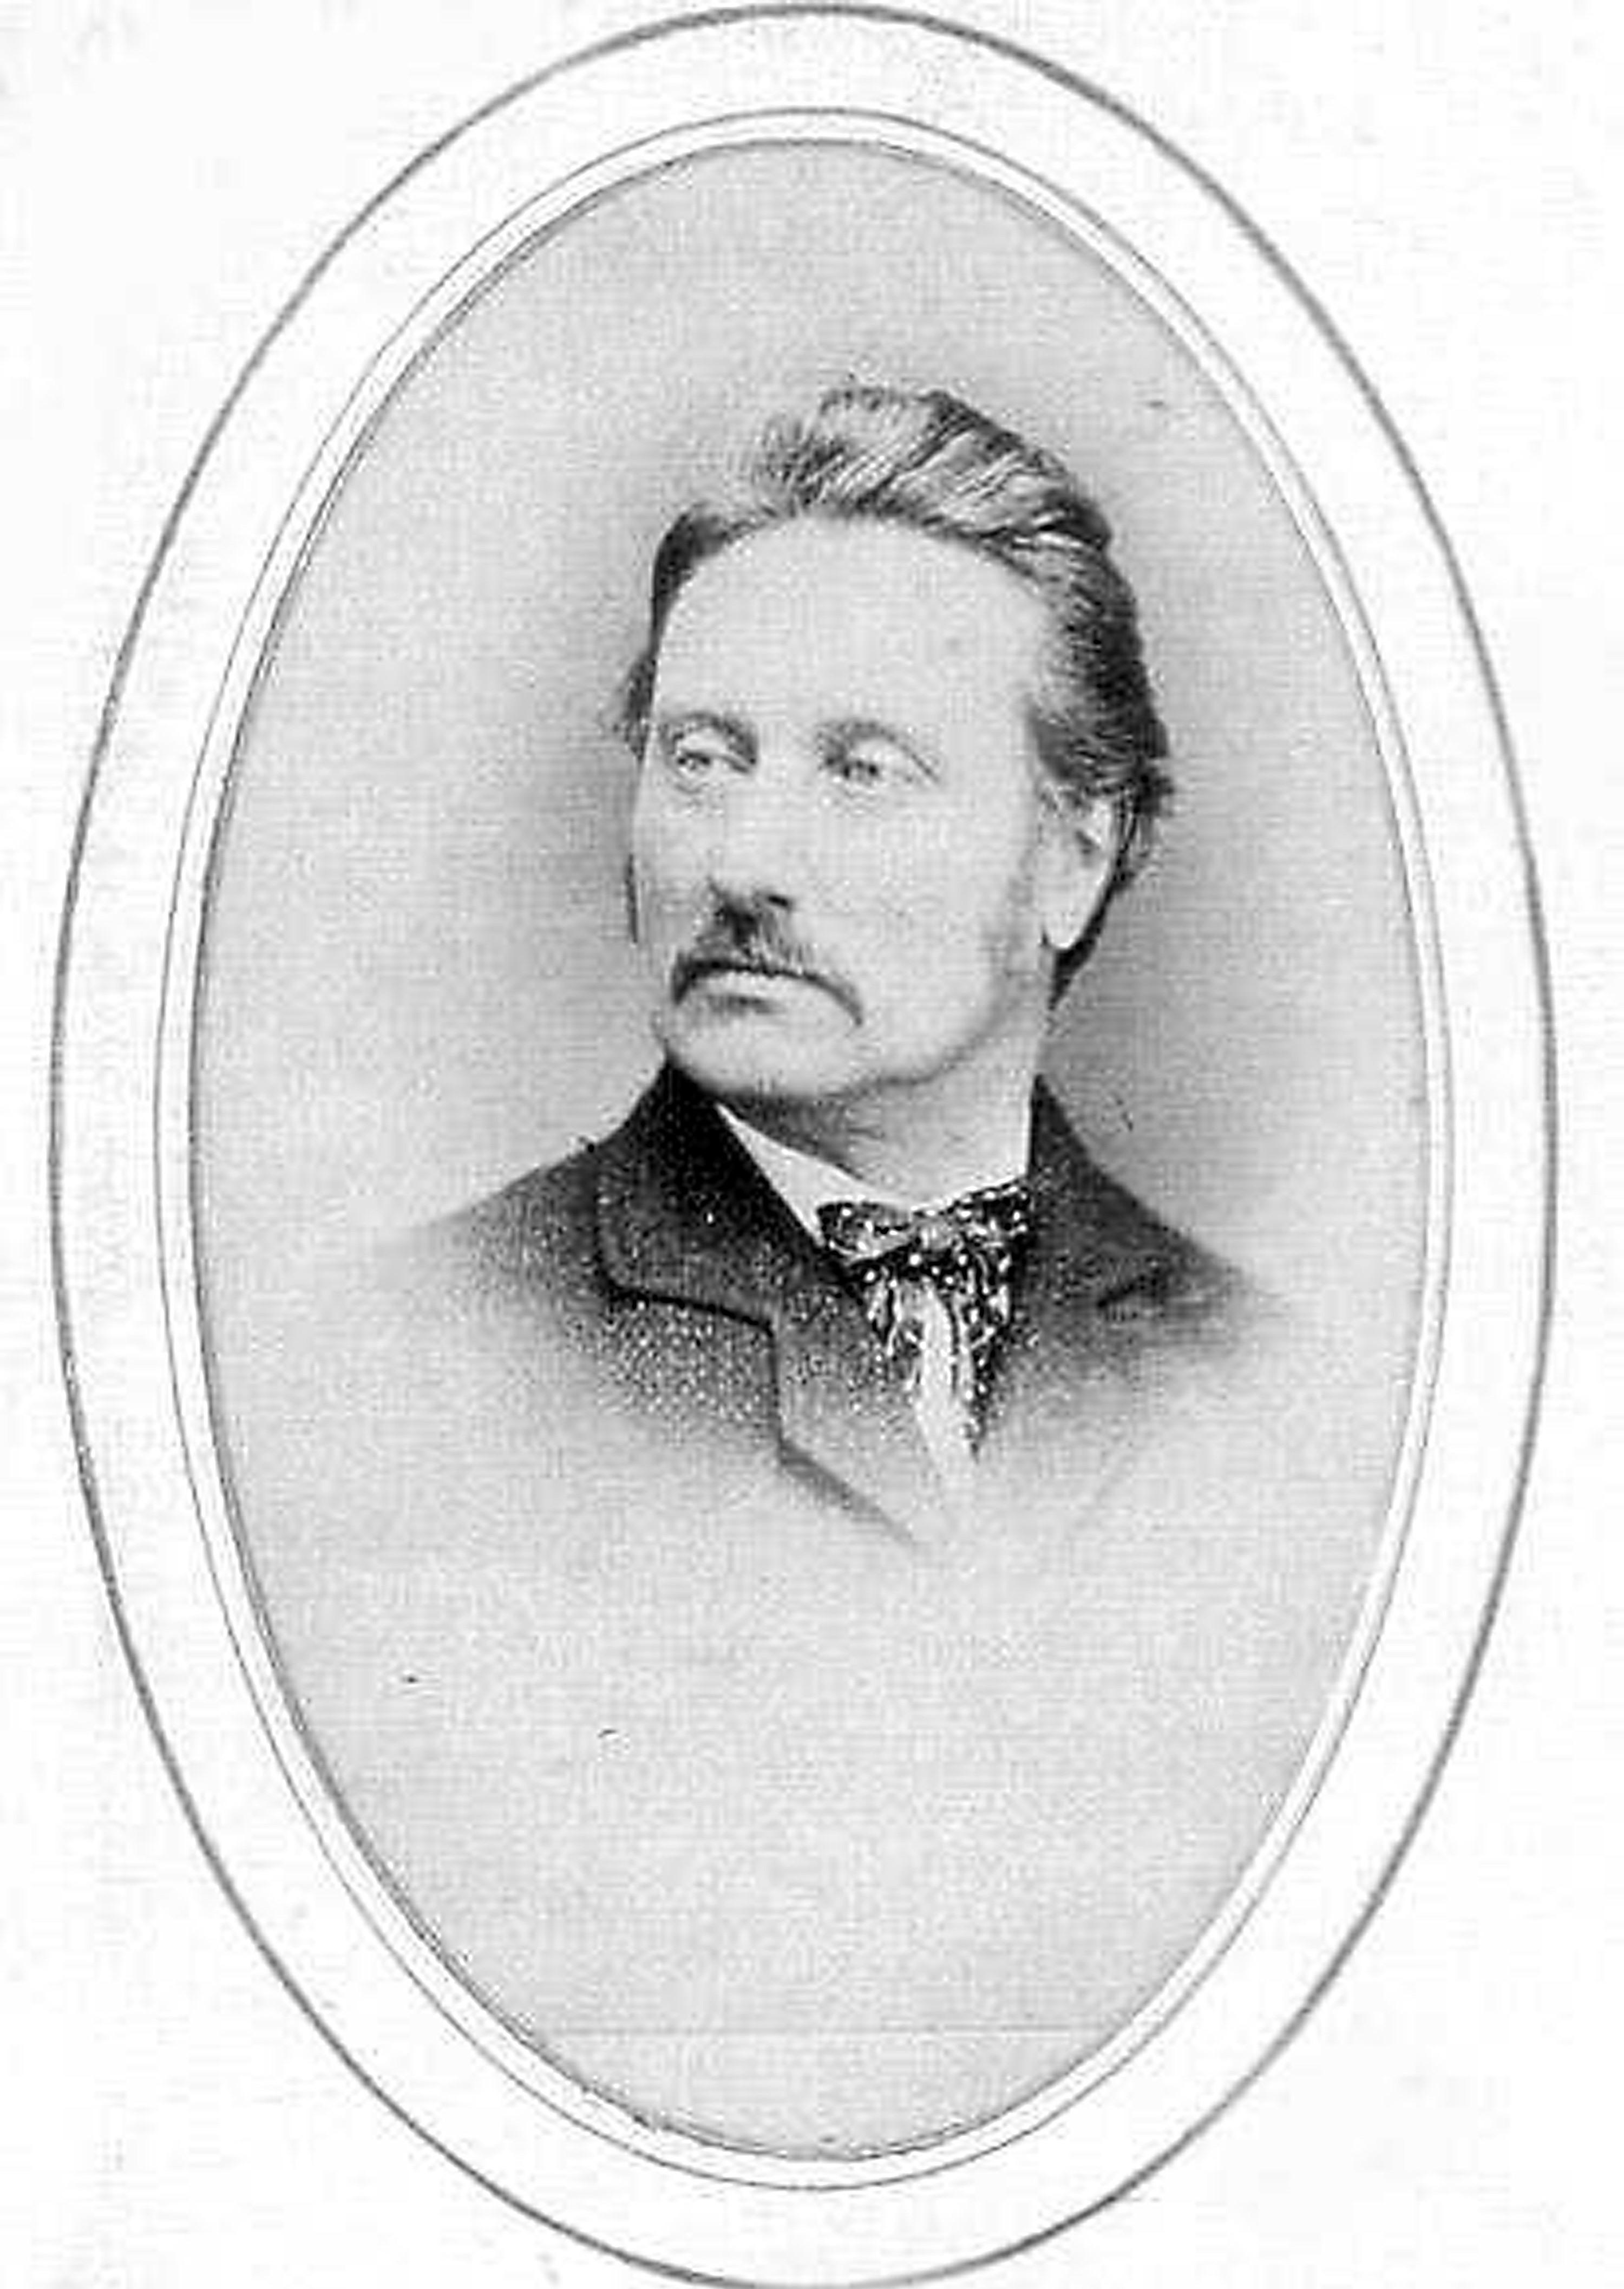 Charles Woollett